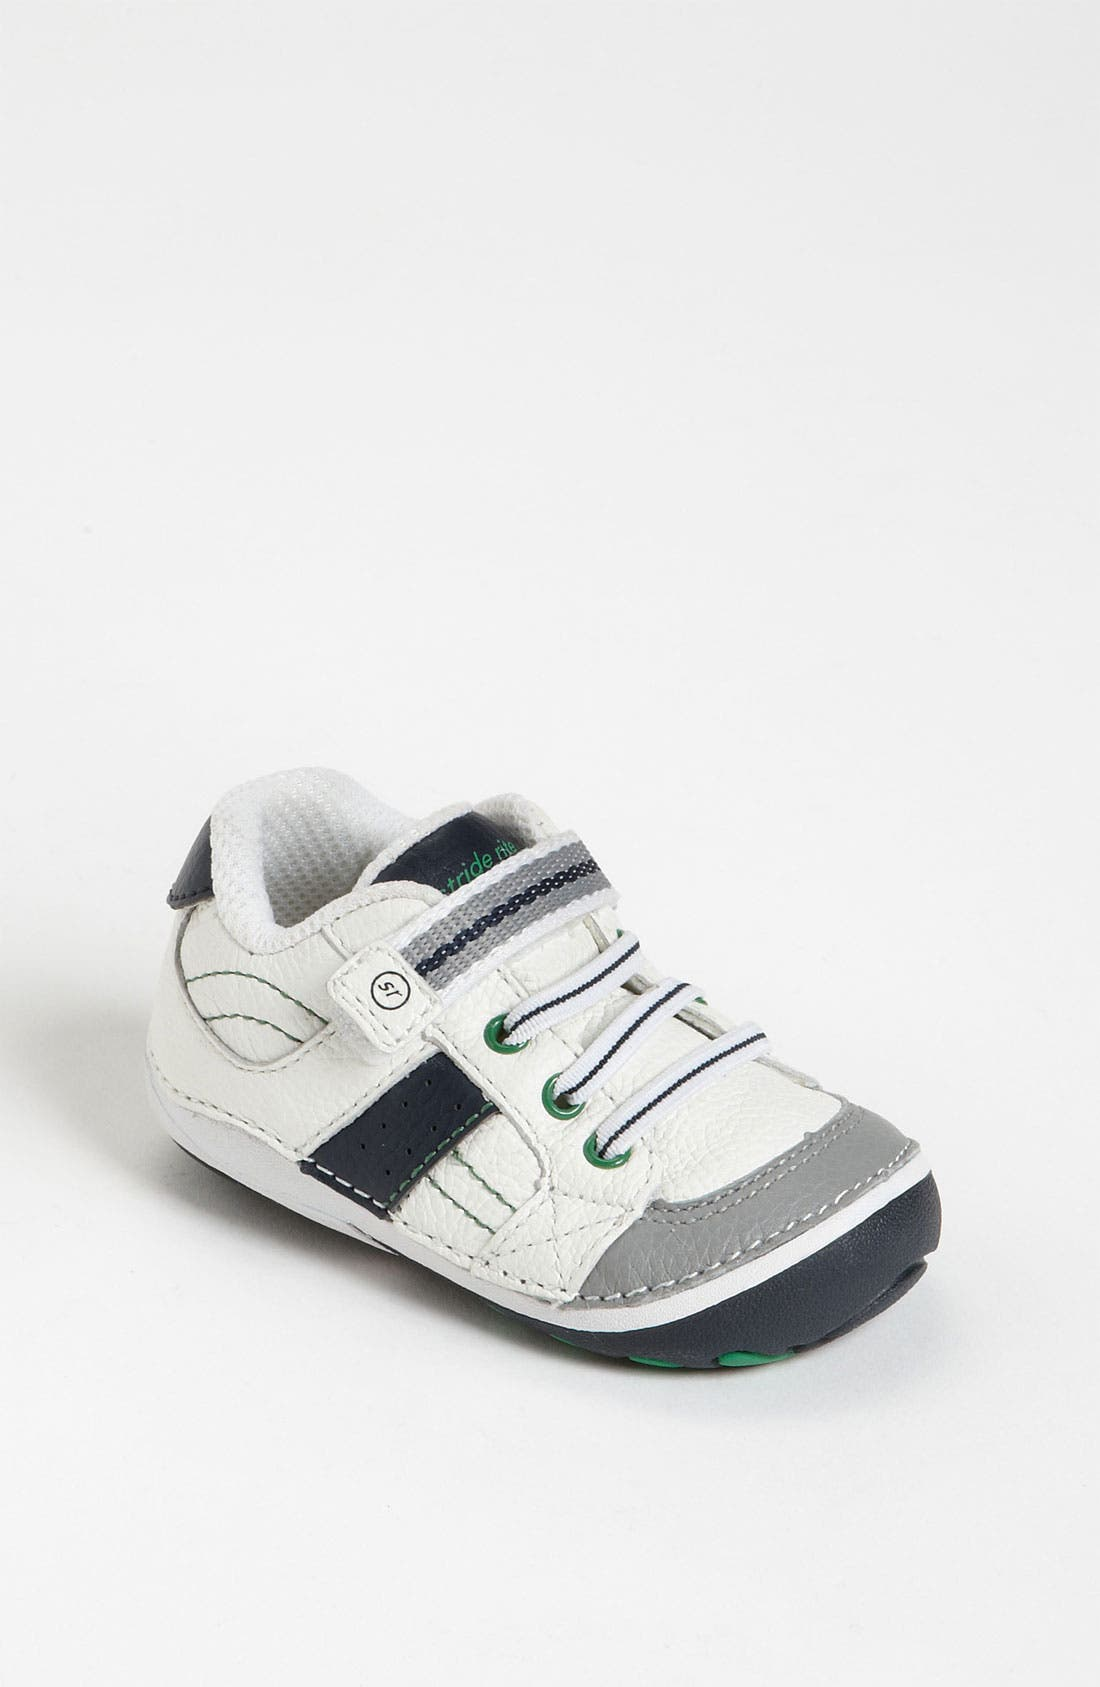 STRIDE RITE, 'Arte' Sneaker, Main thumbnail 1, color, WHITE/ NAVY